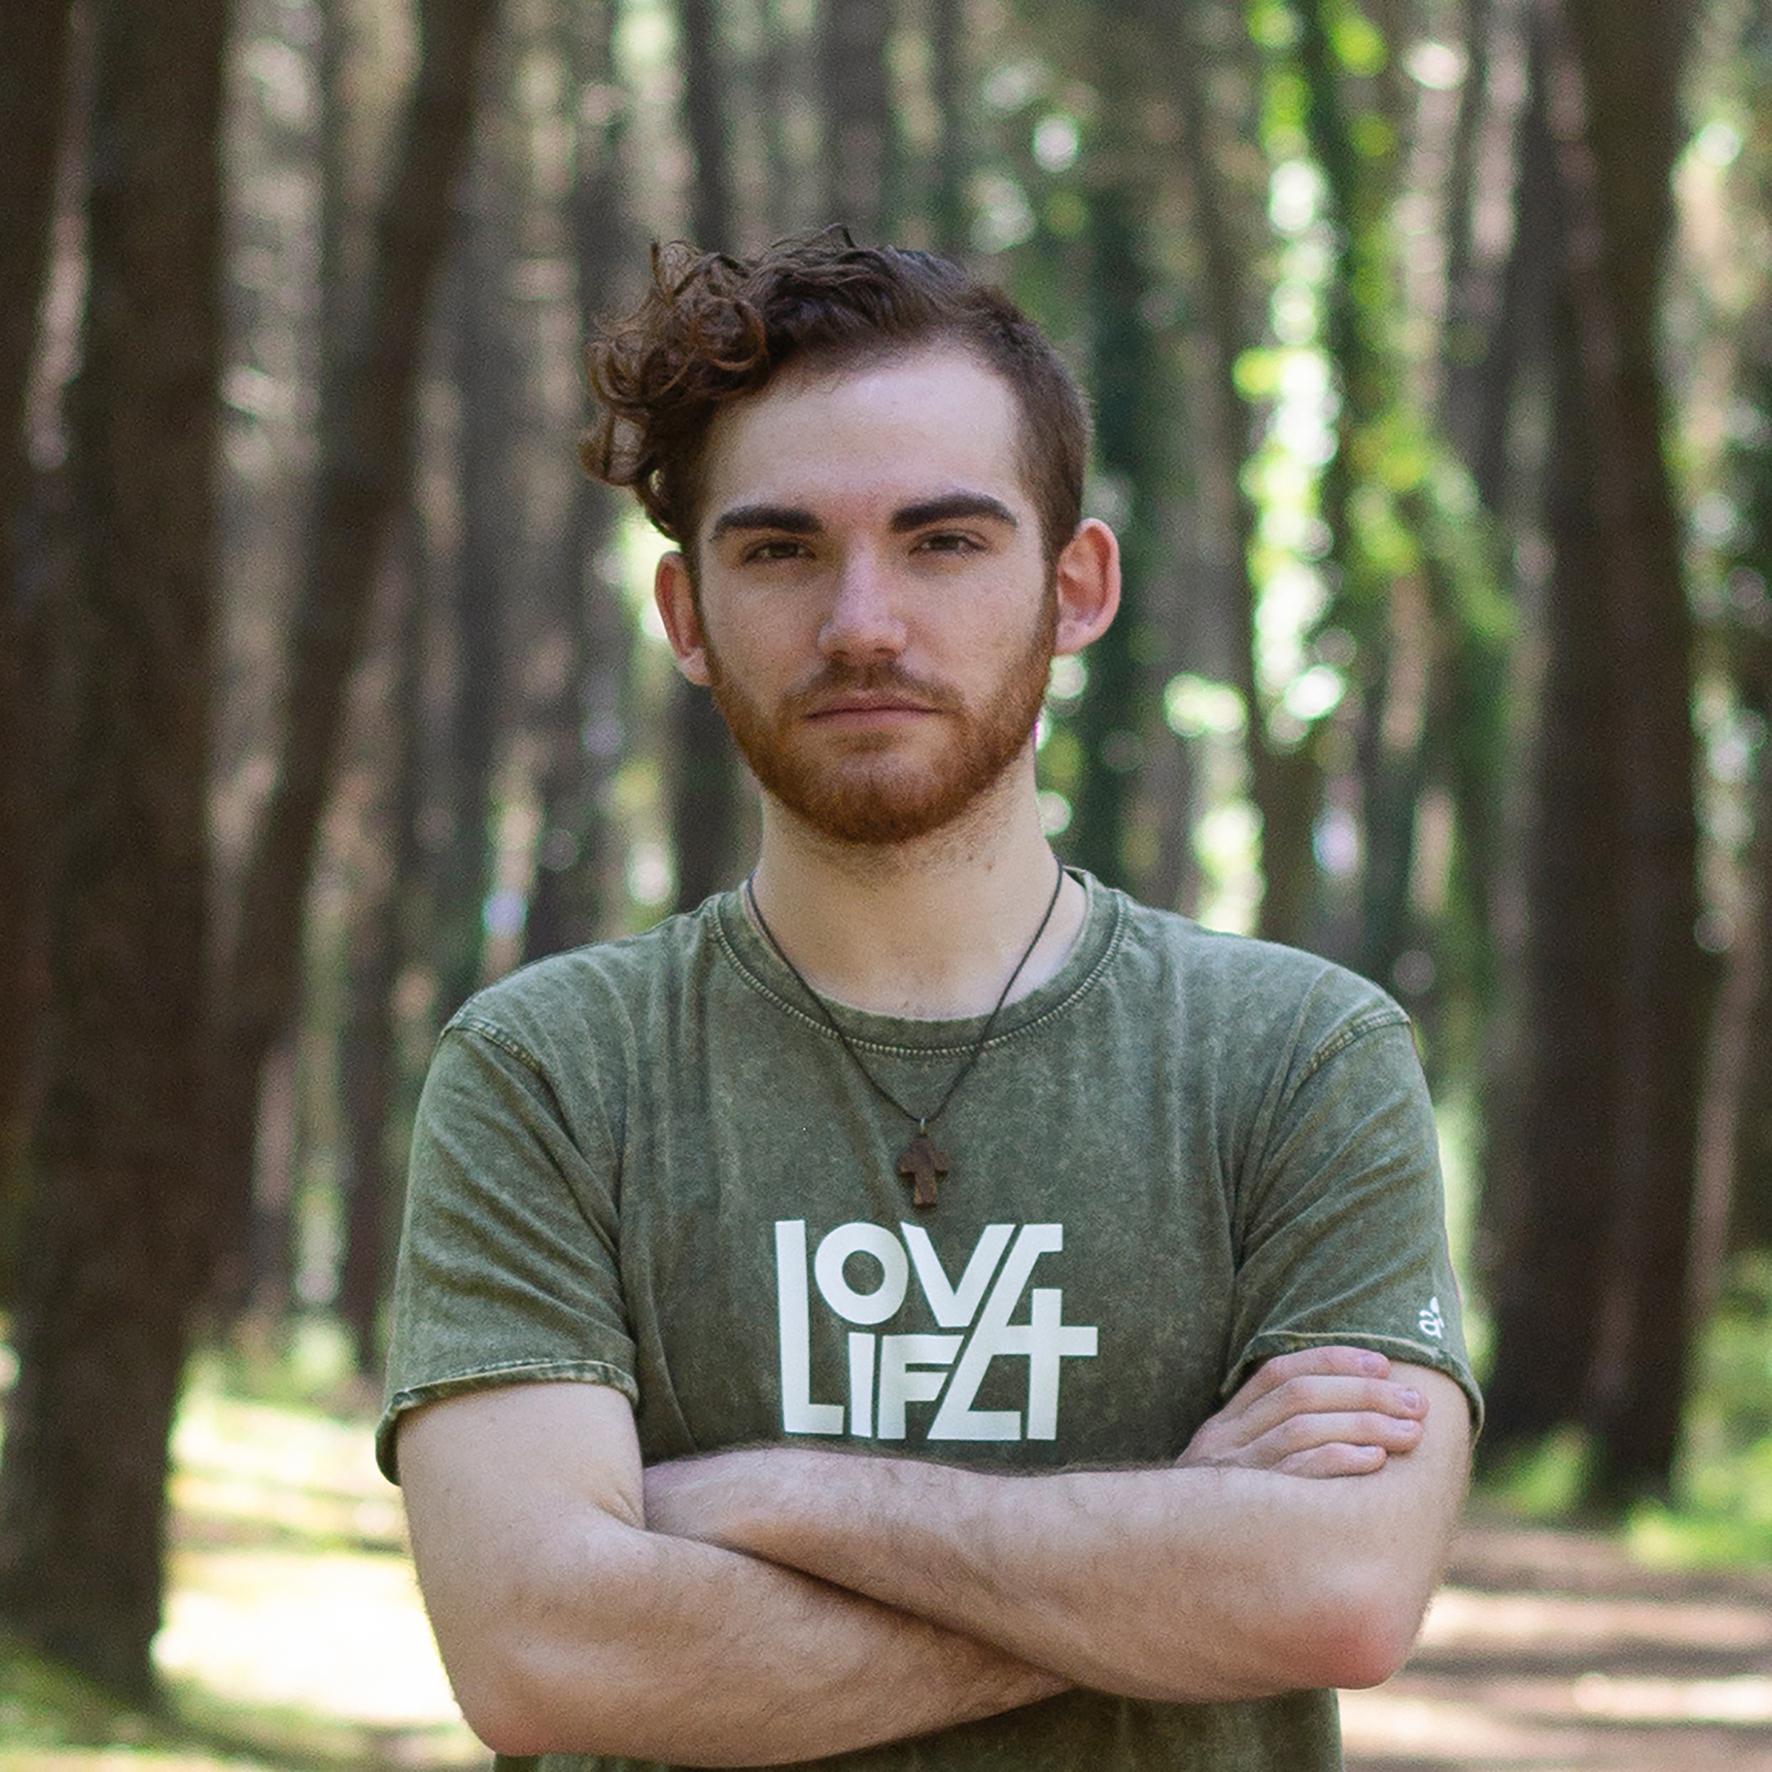 Camiseta cristiana Love / Life chico